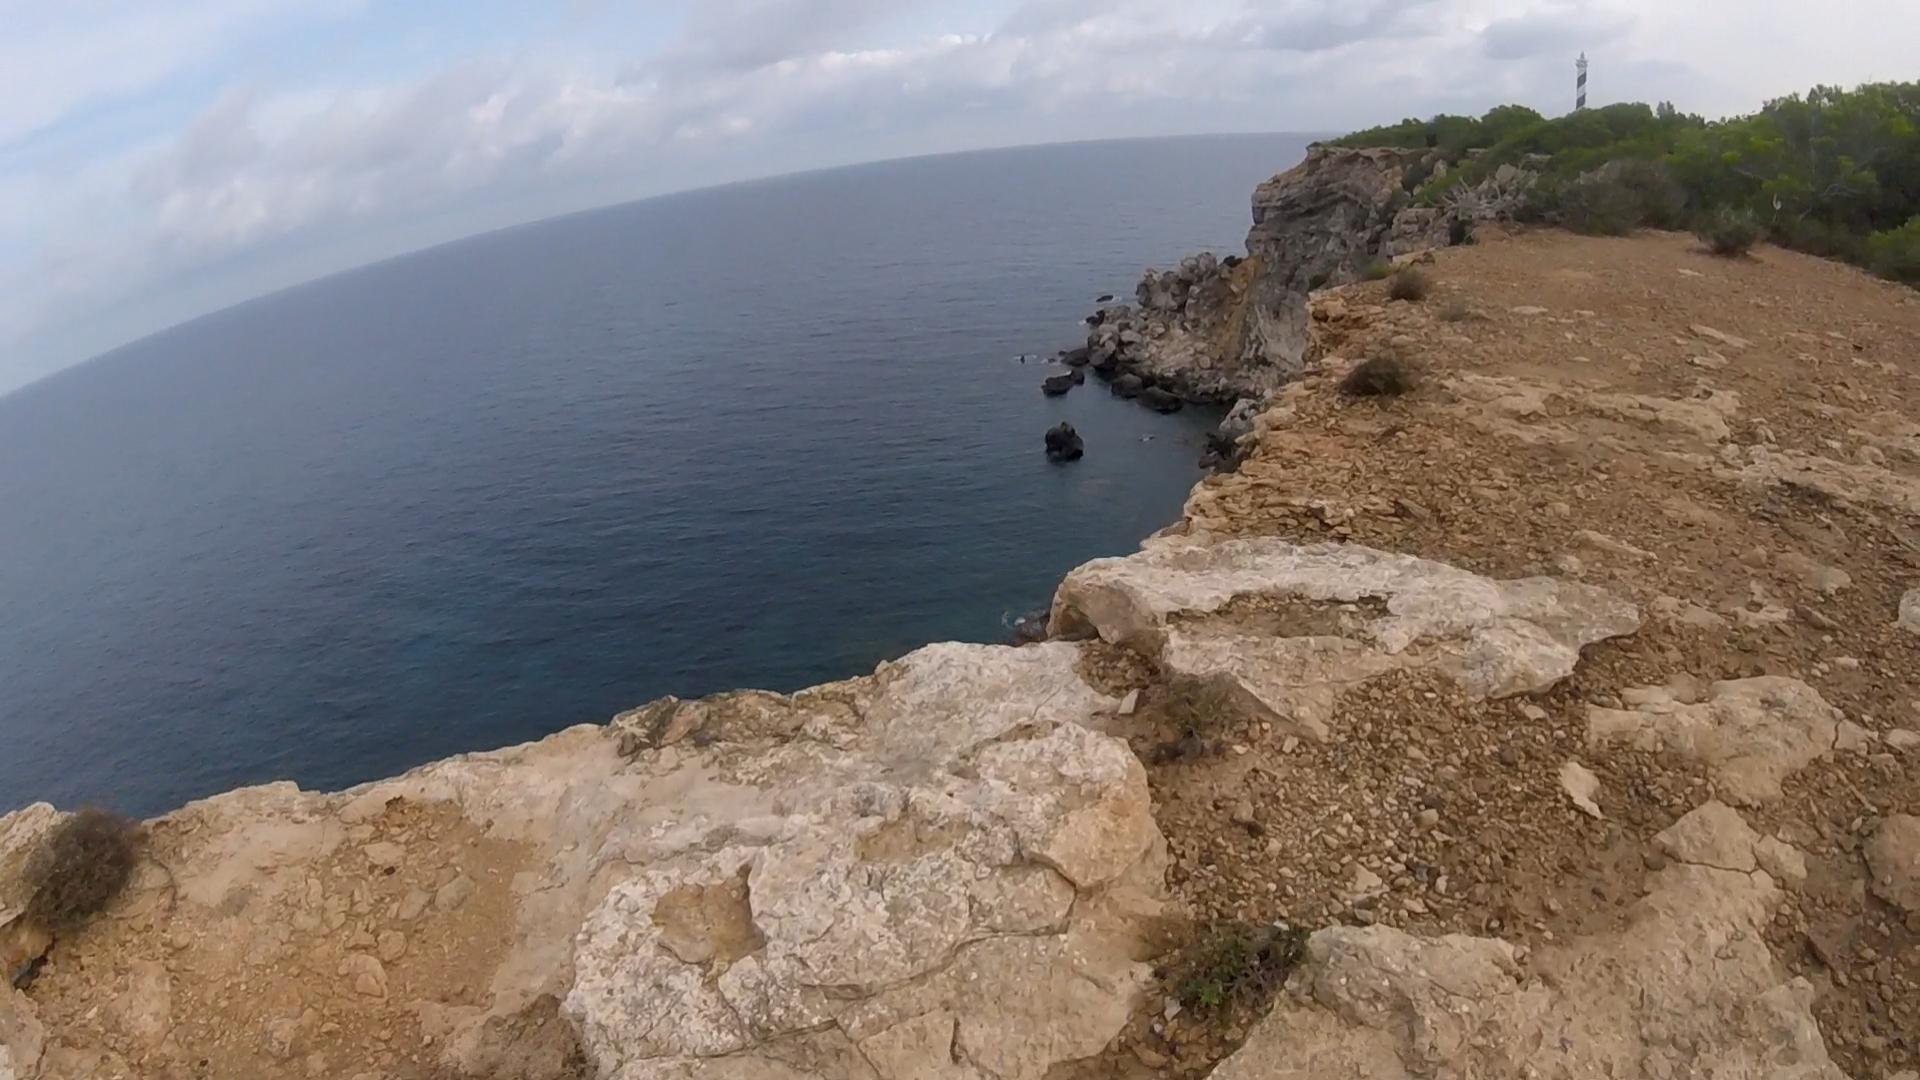 The Mighty Sant Joan CxM - Portinatx Cliffs - RunIbiza.jpg